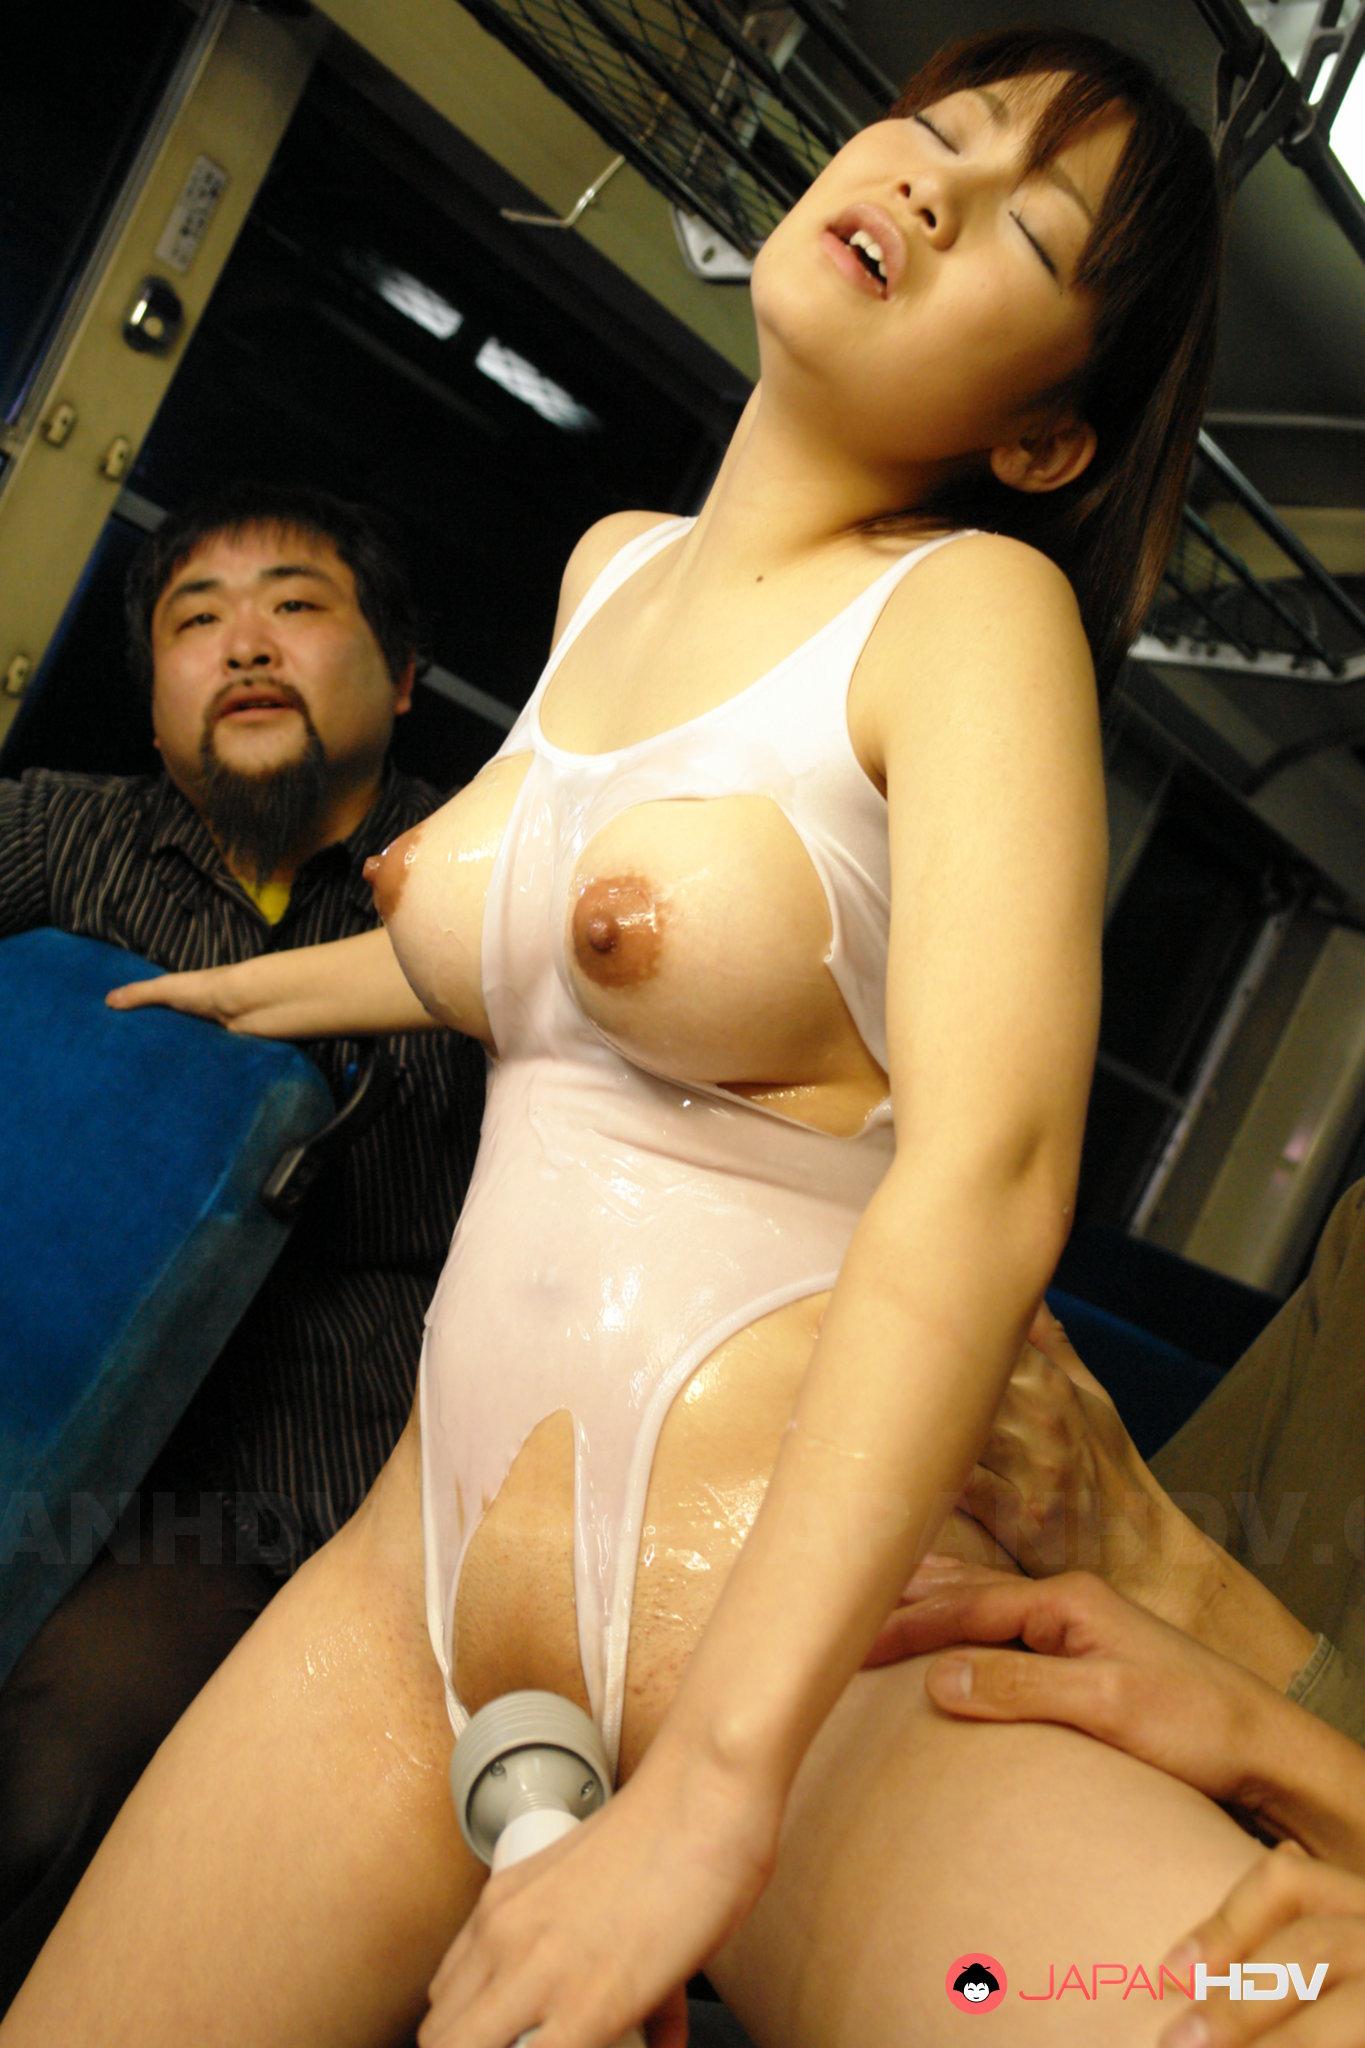 Встал взял порно автобус японцы